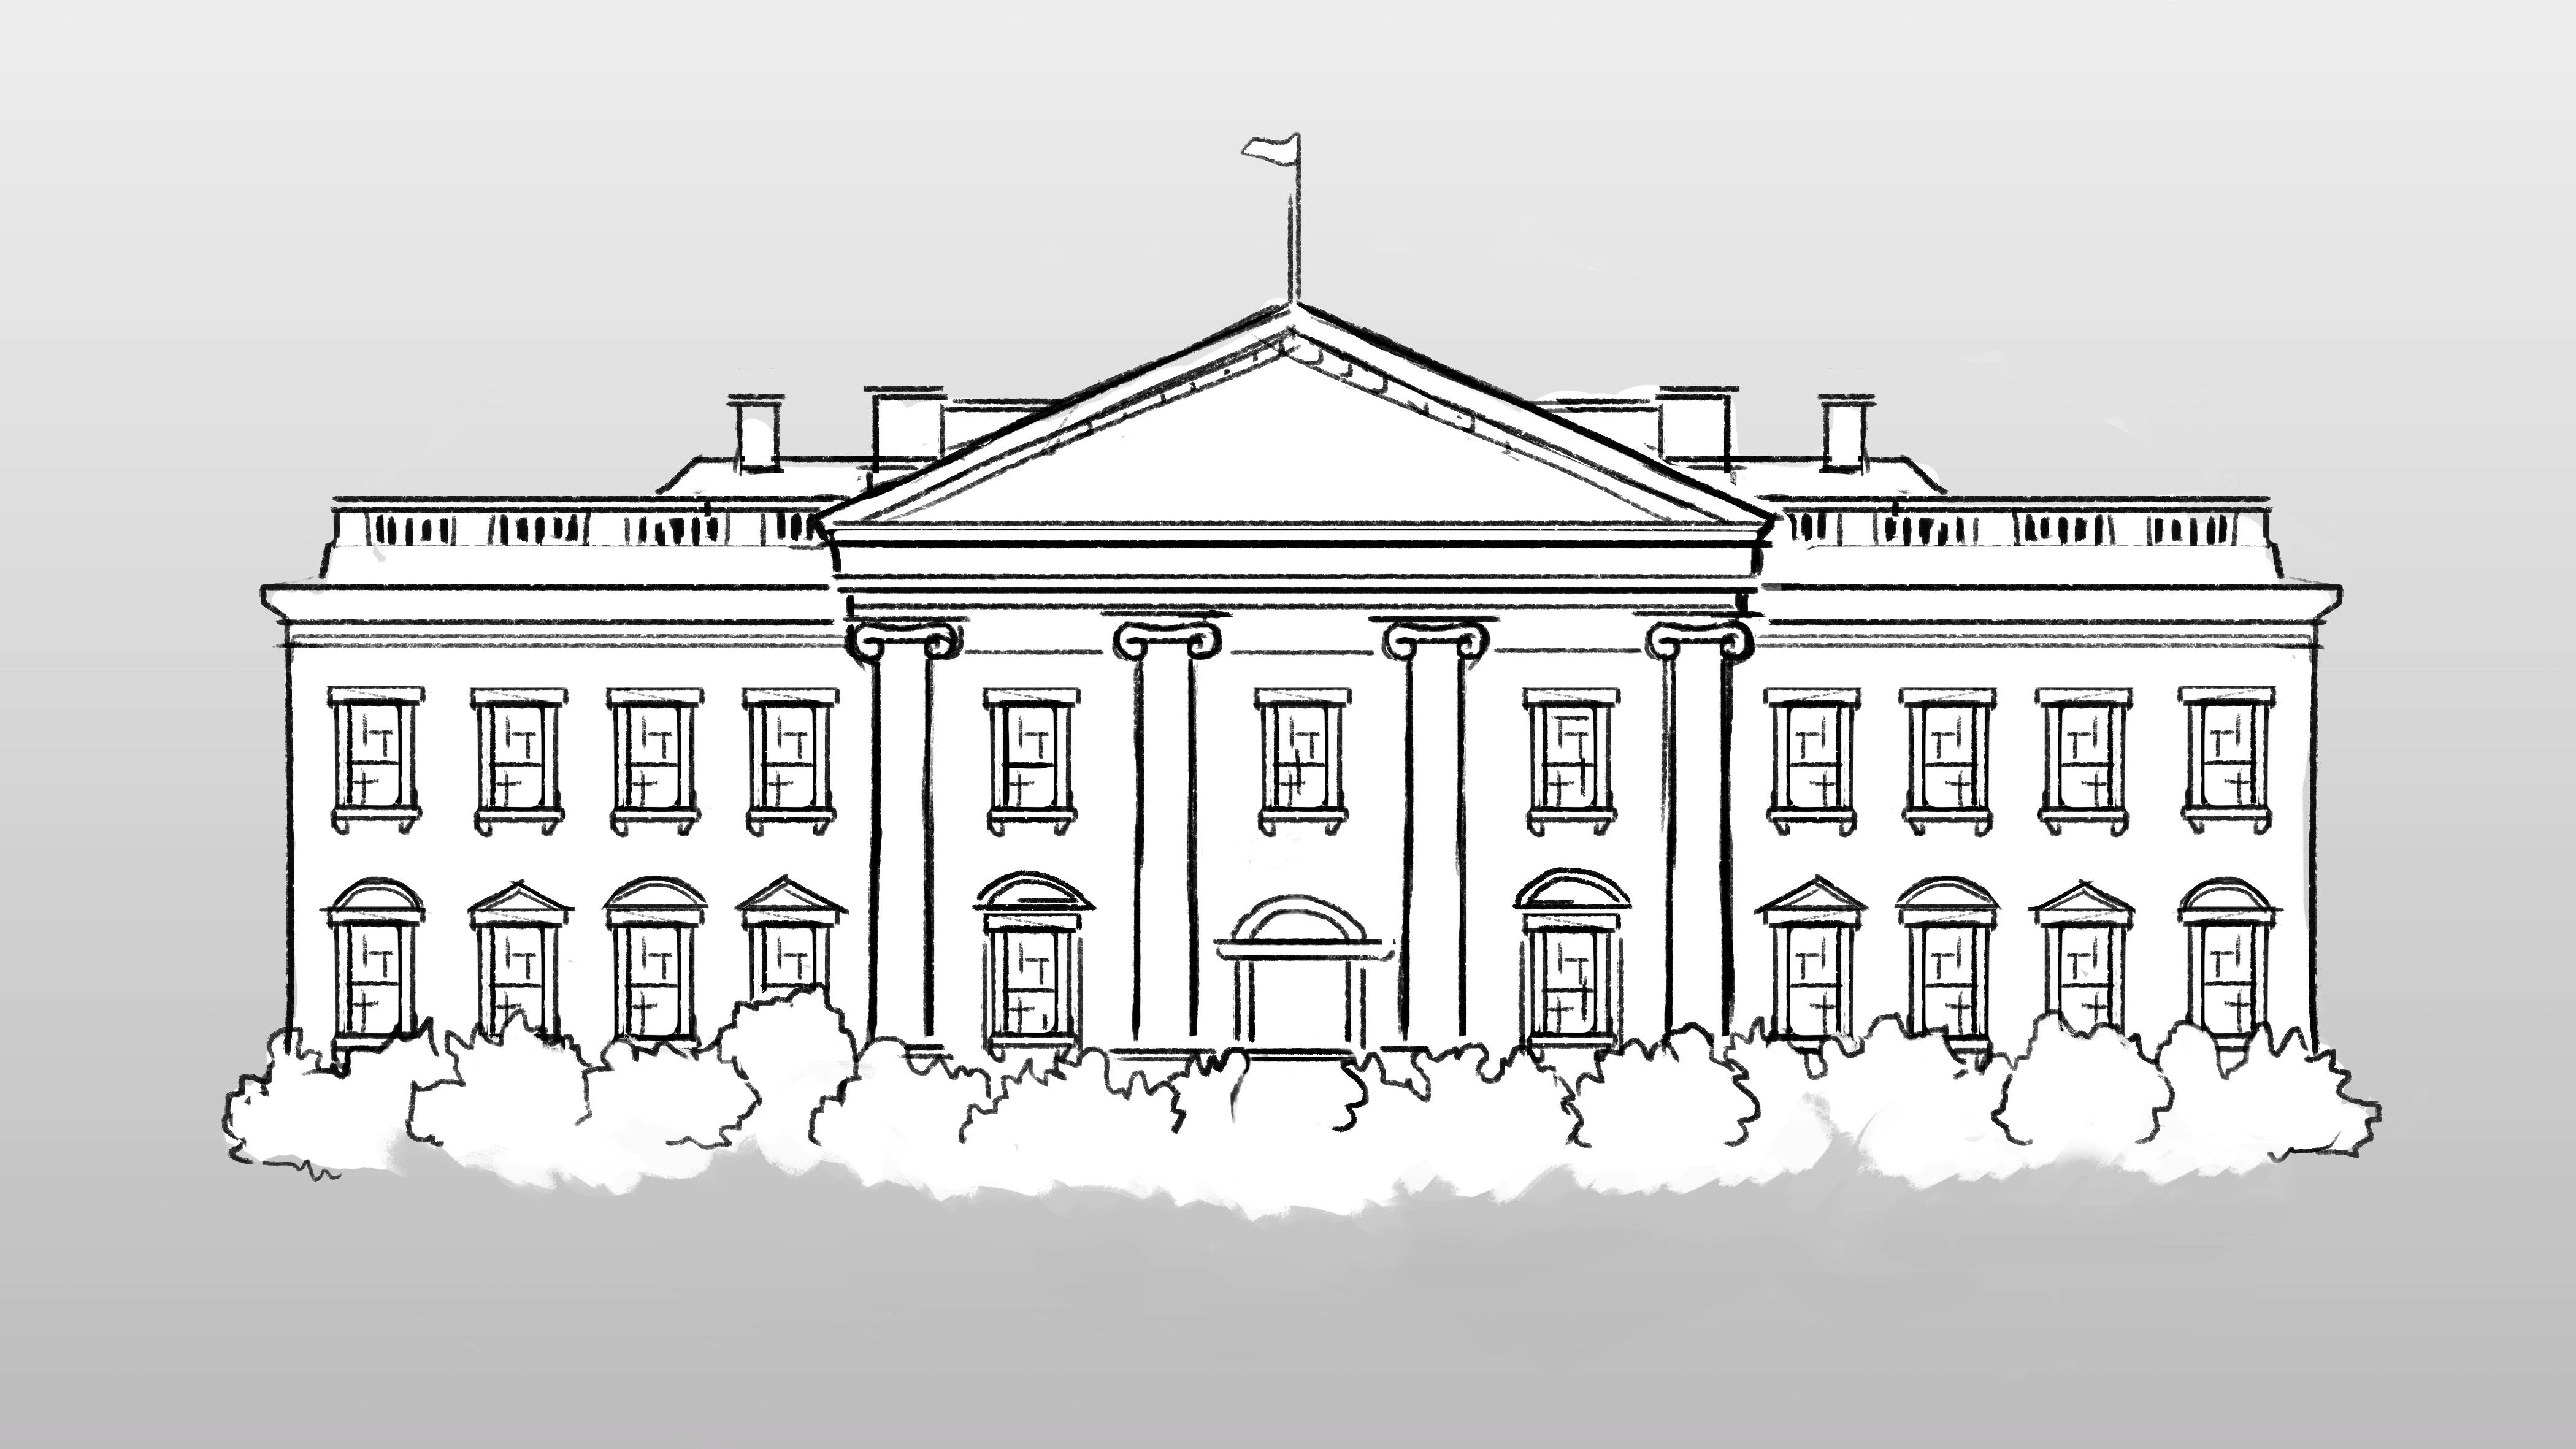 NPR whitehouse